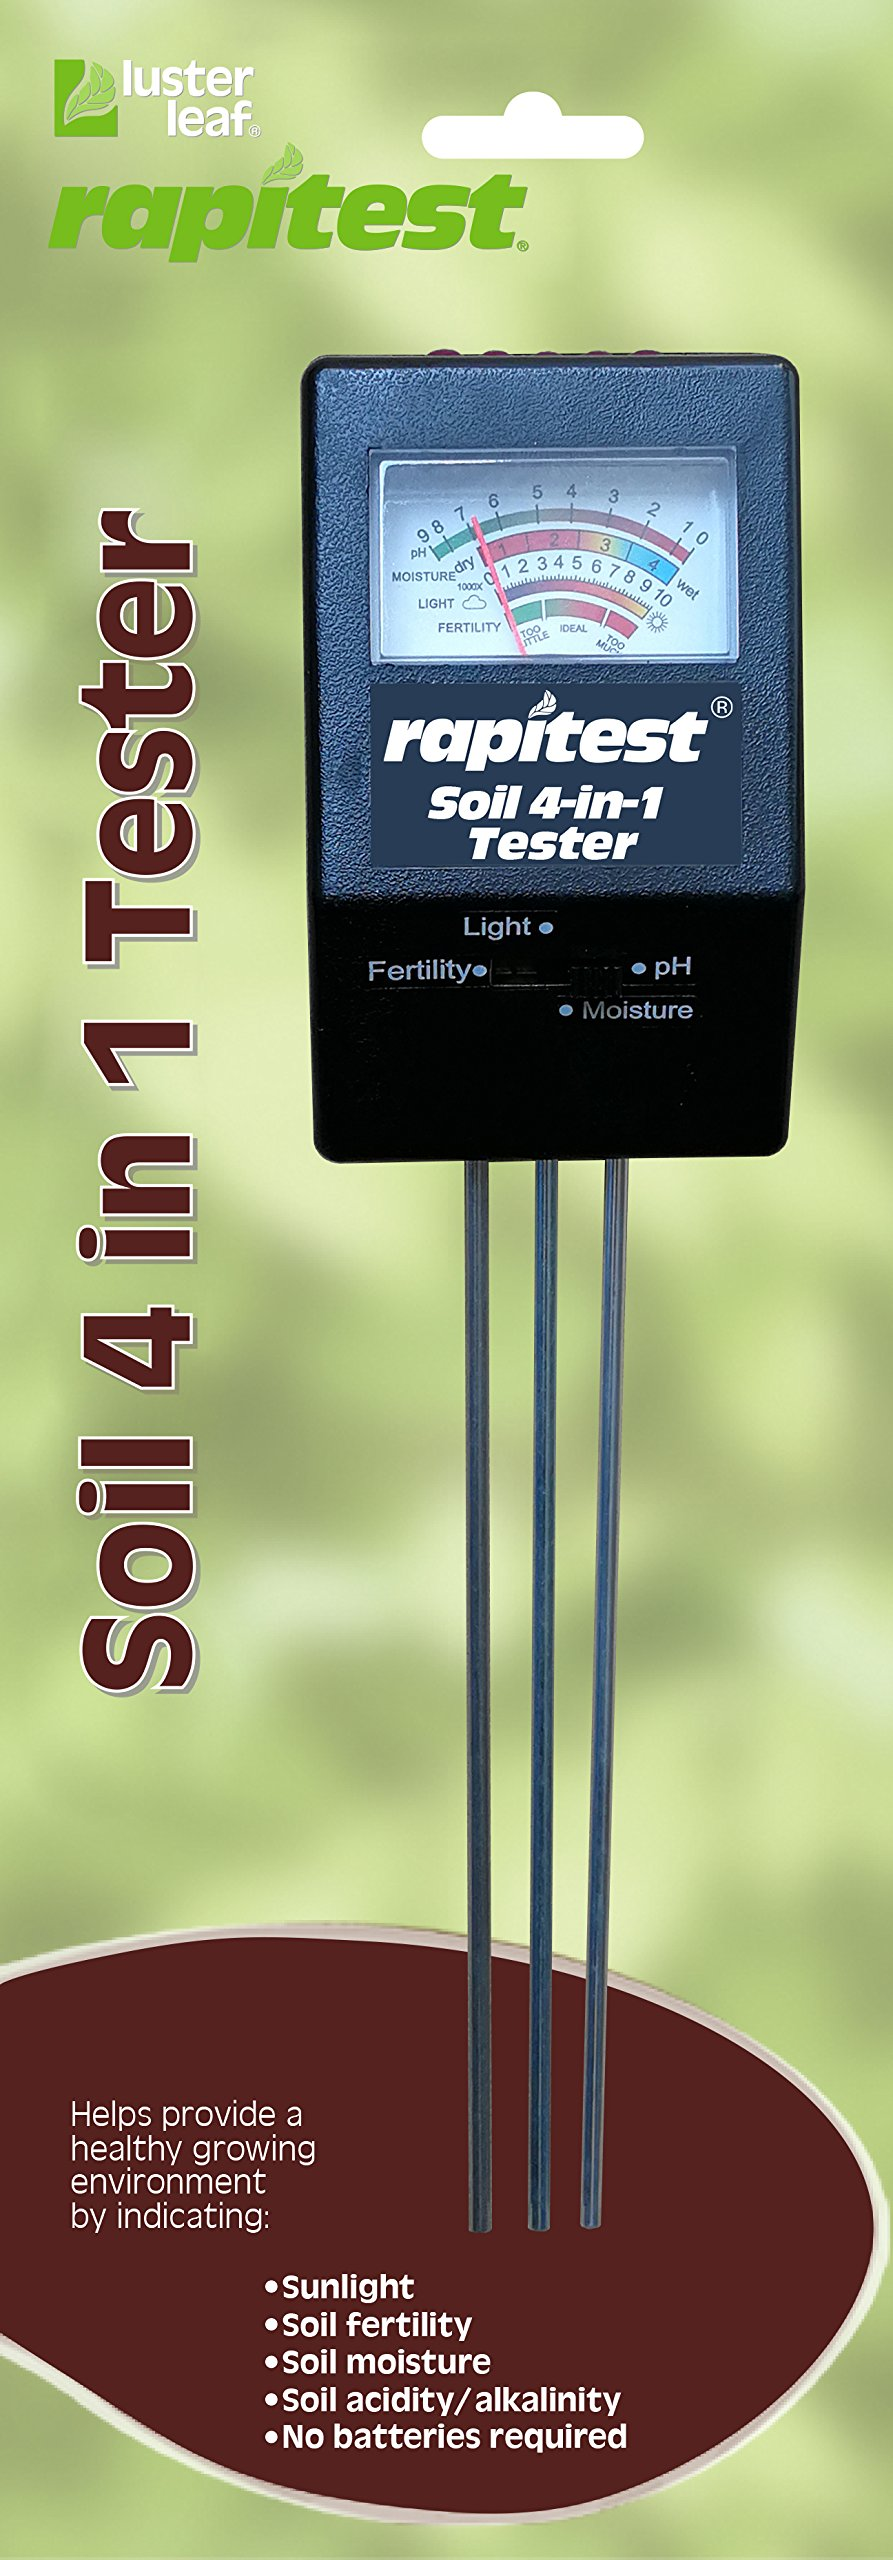 Luster Leaf 1818 Rapitest Mini 4-in-1 Soil Tester